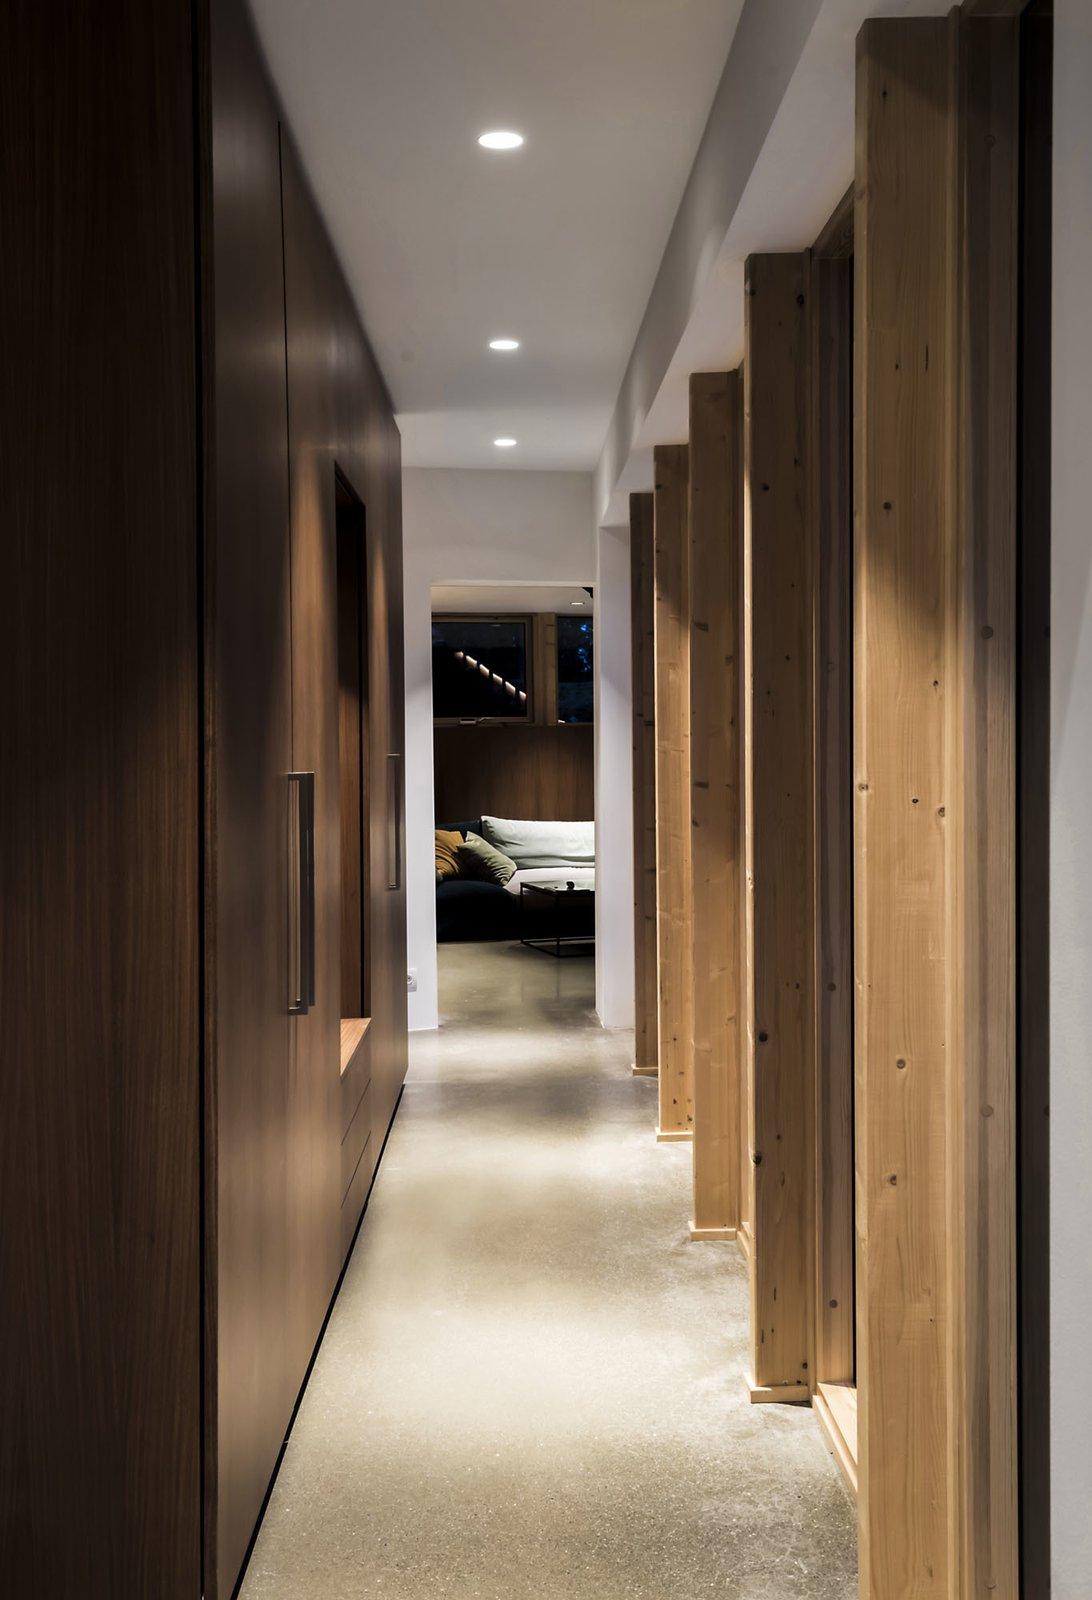 Storage Room and Closet Storage Type iconic passage  Woodland house